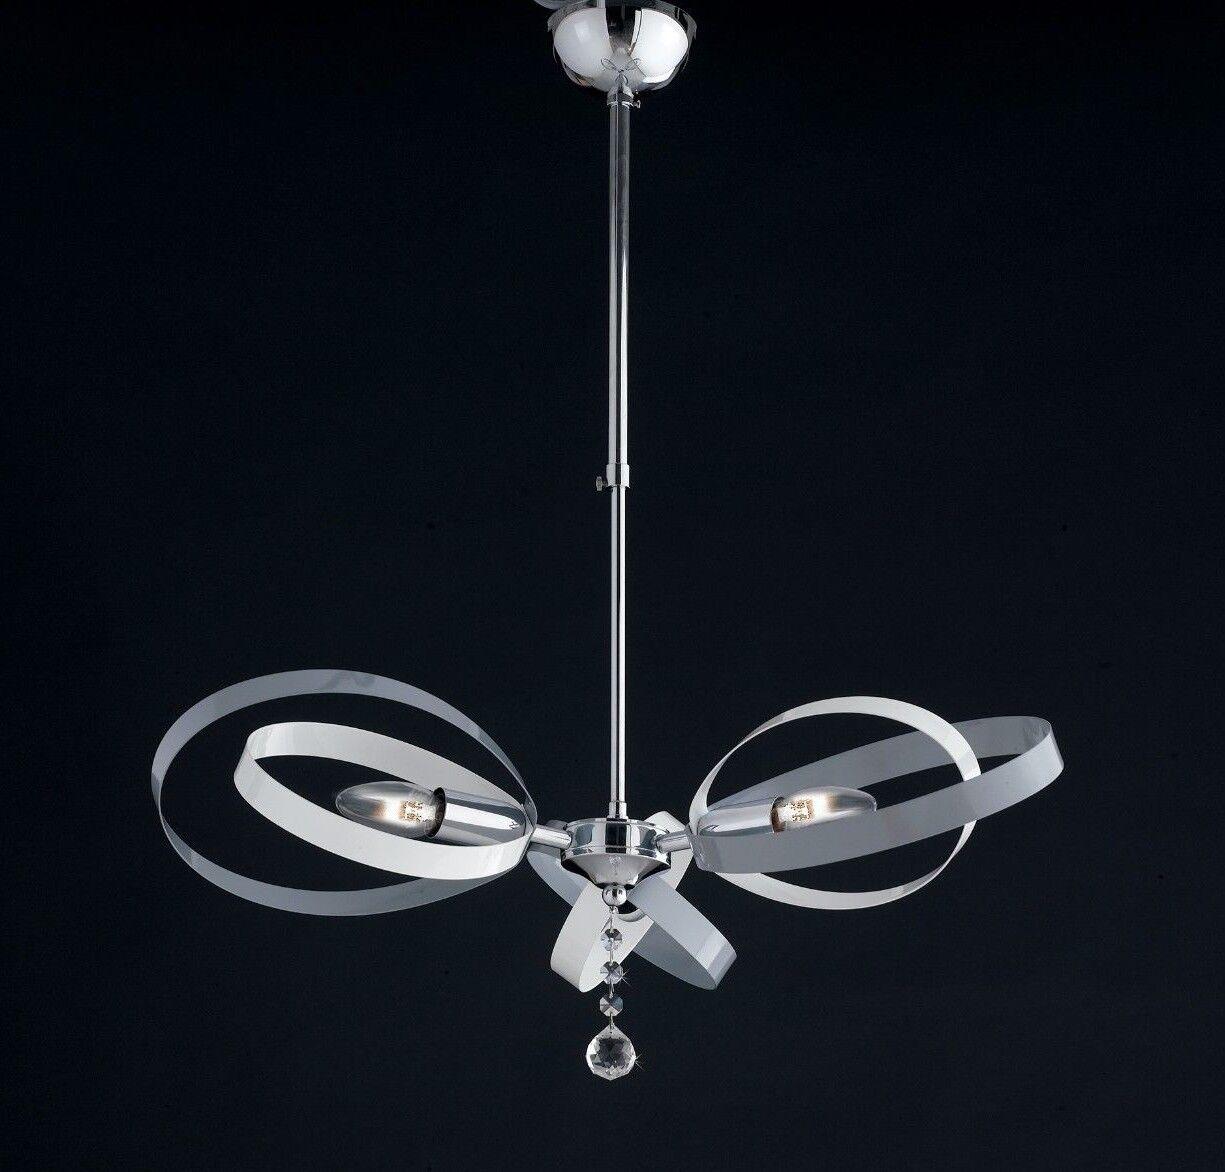 Sospensione lampadario PIACERE moderno cromato colorato COLORI COMBINABILI A PIACERE lampadario c5c563